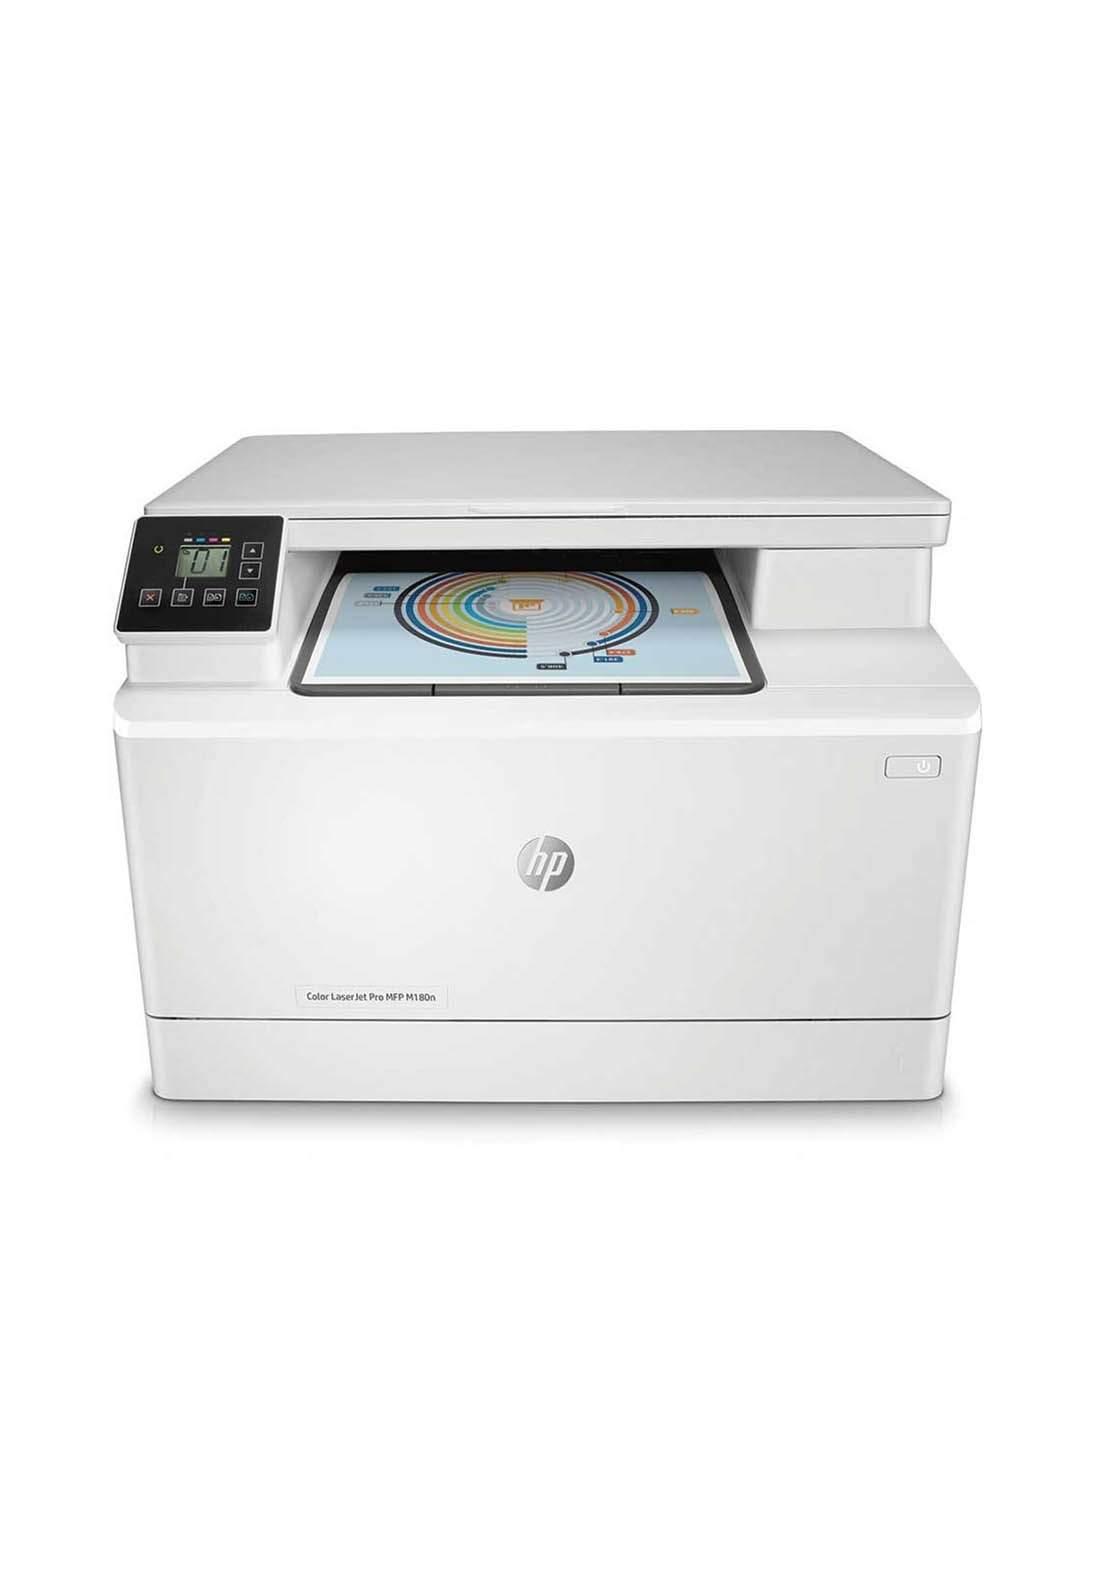 HP M180n Color LaserJet Pro MFP Network Printer - White طابعة